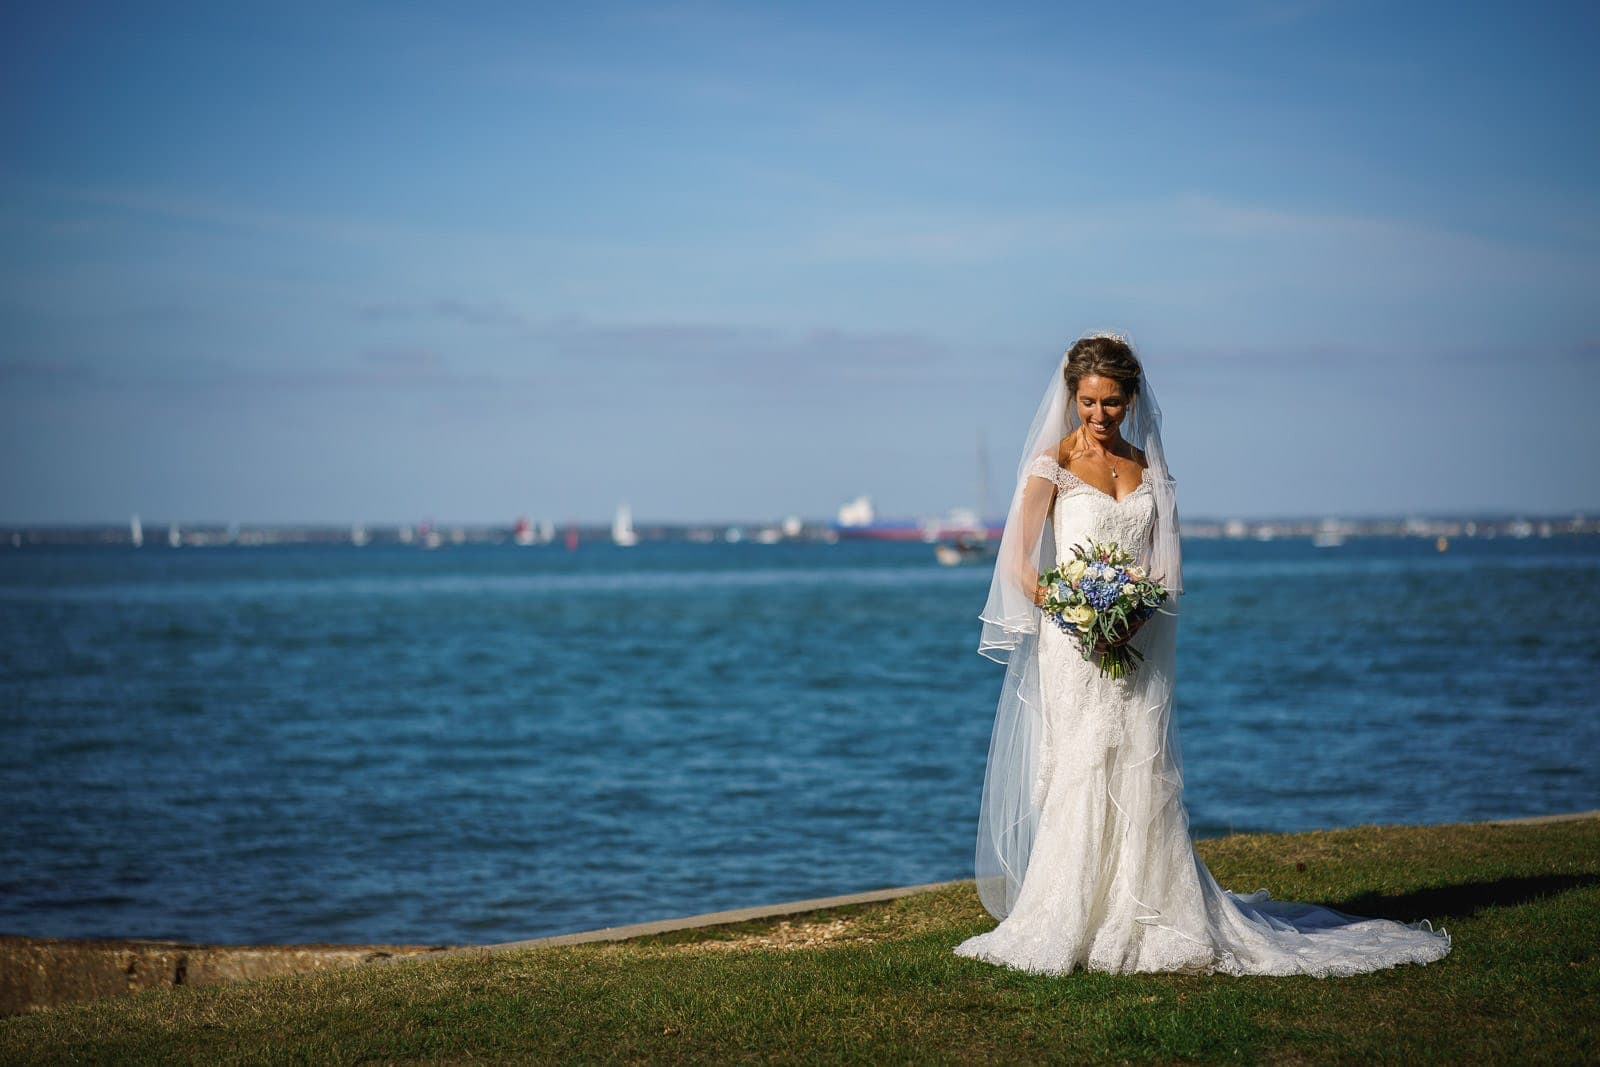 Wedding on Isle of Wight